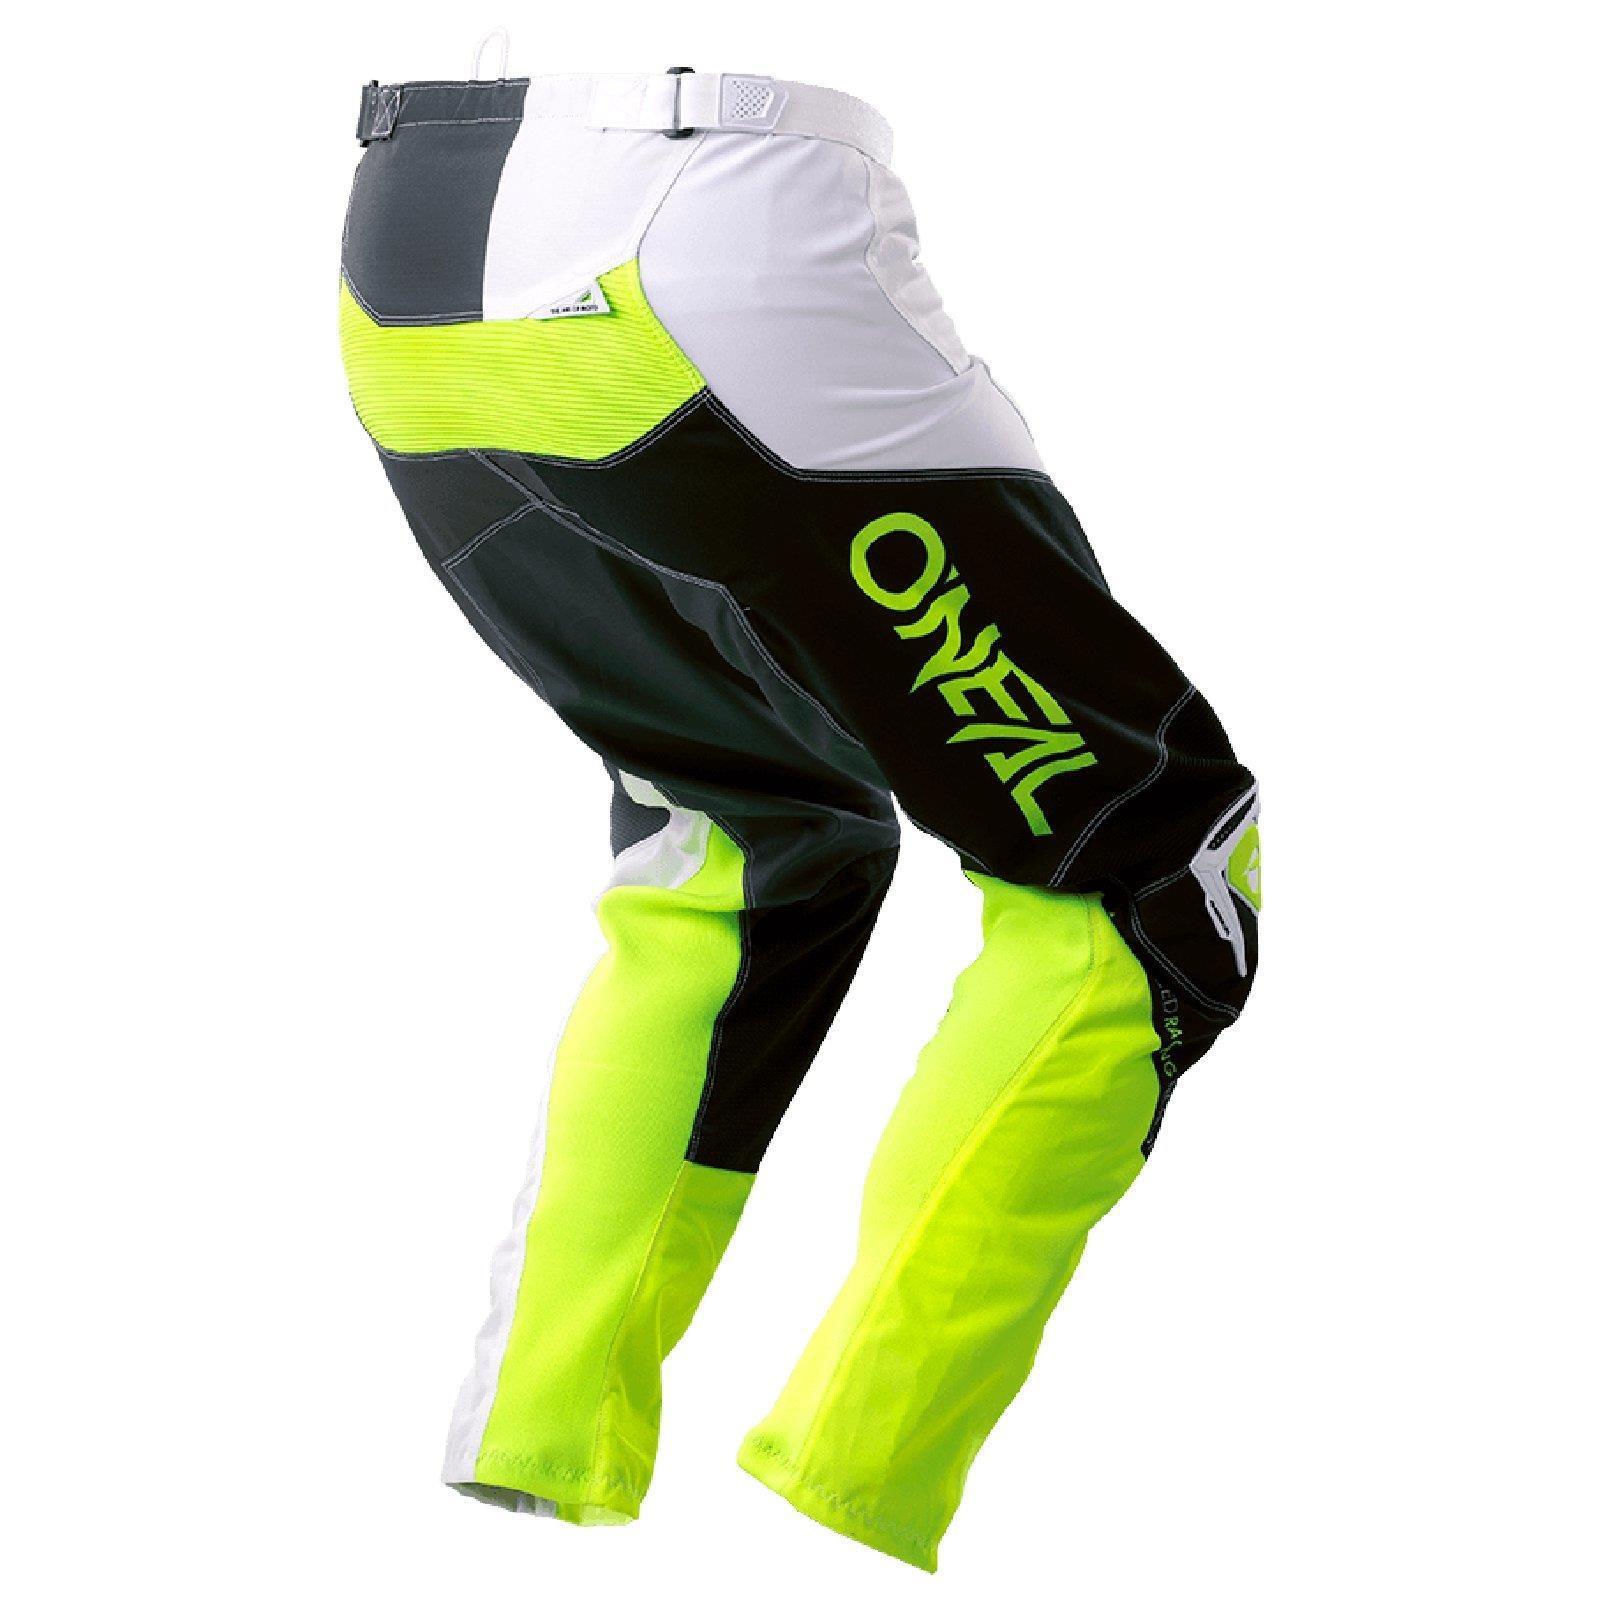 Bicicleta-de-montana-Enduro-MTB-downhill-pantalones-los-pantalones-oNeal-mayhem-que-Lite-split-Moto miniatura 11